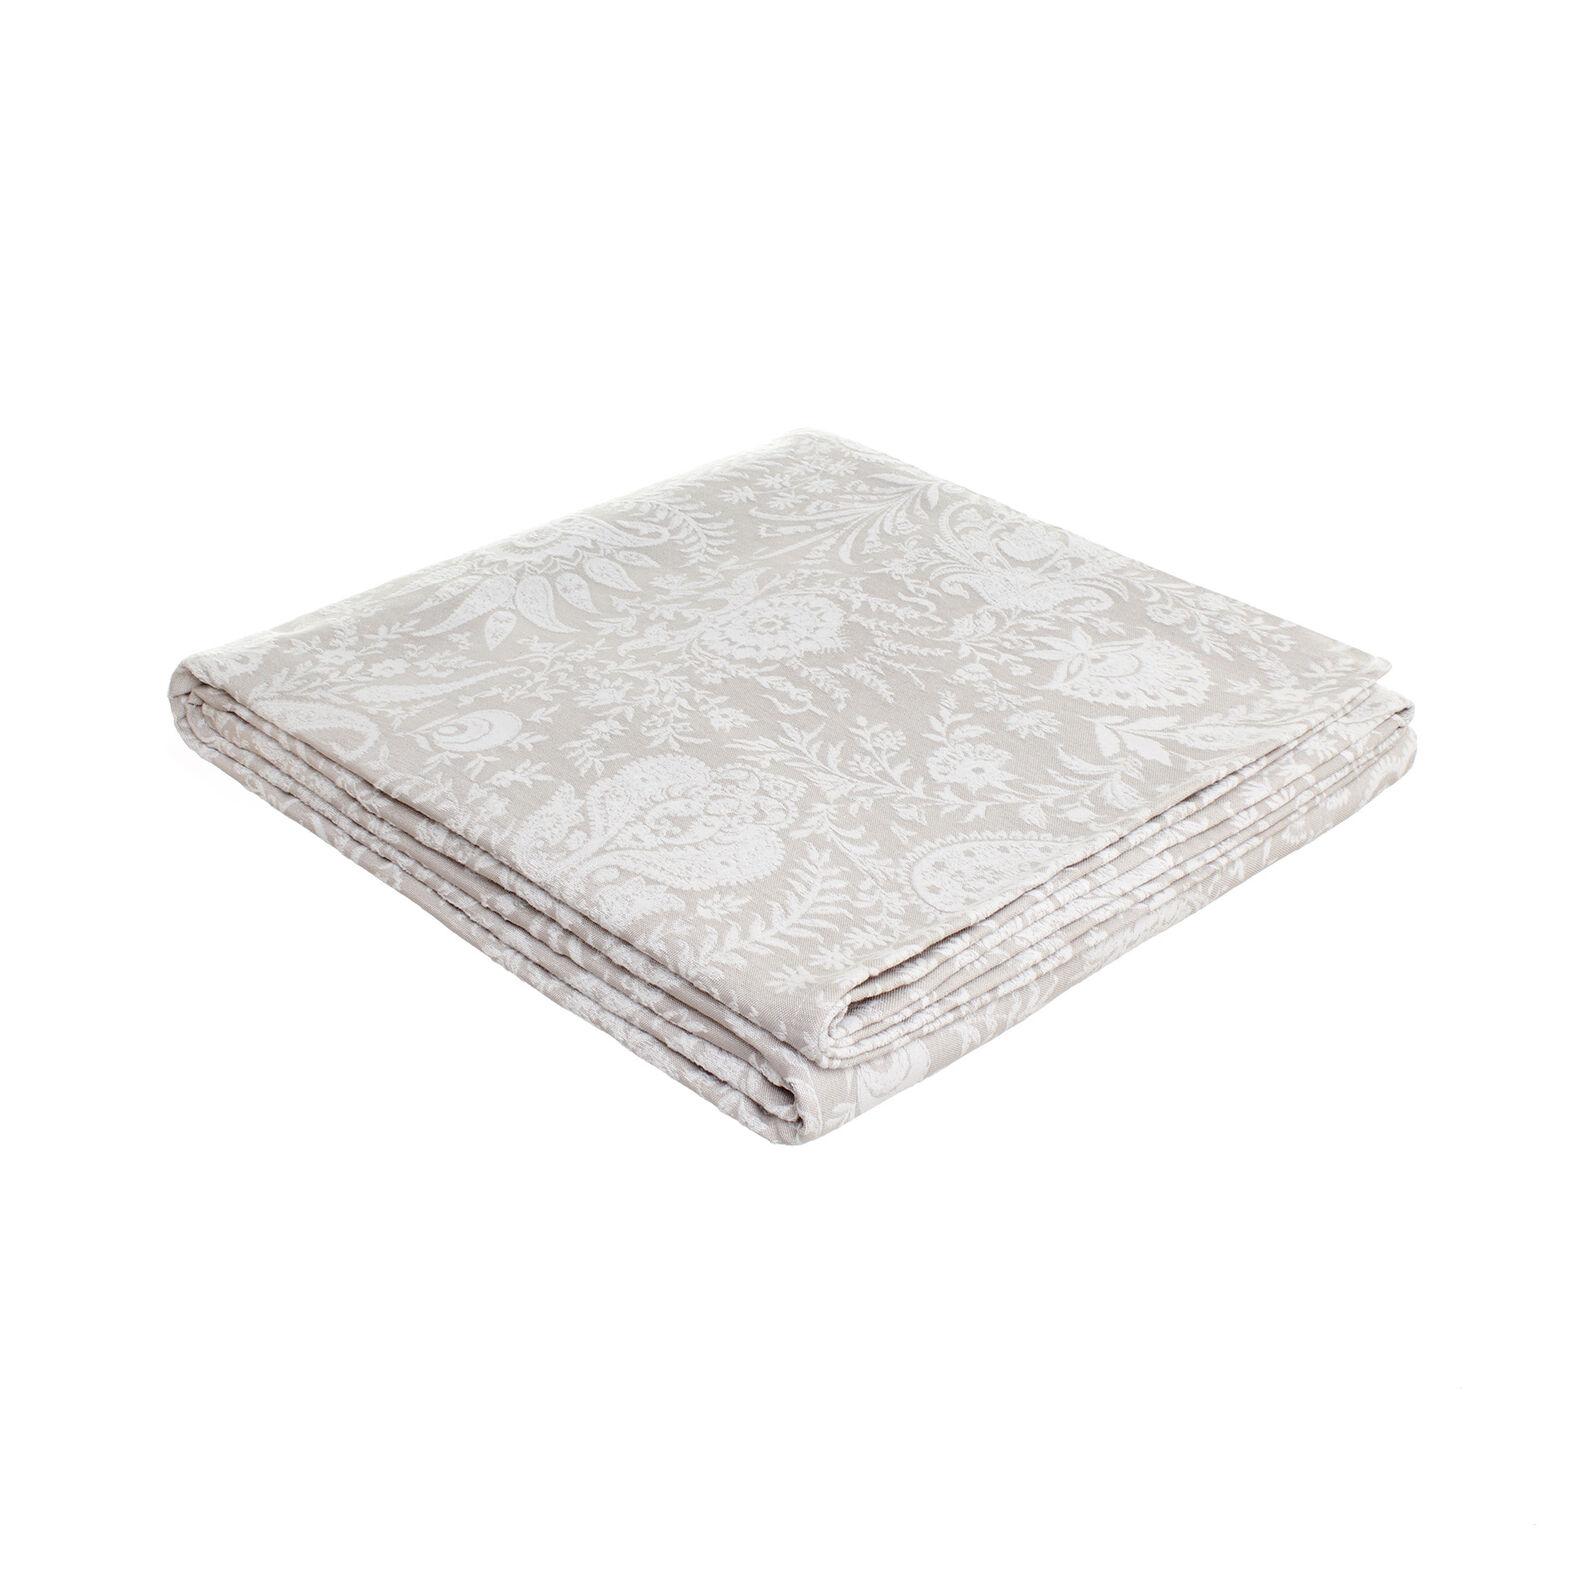 Poryofino bedspread with jacquard processing